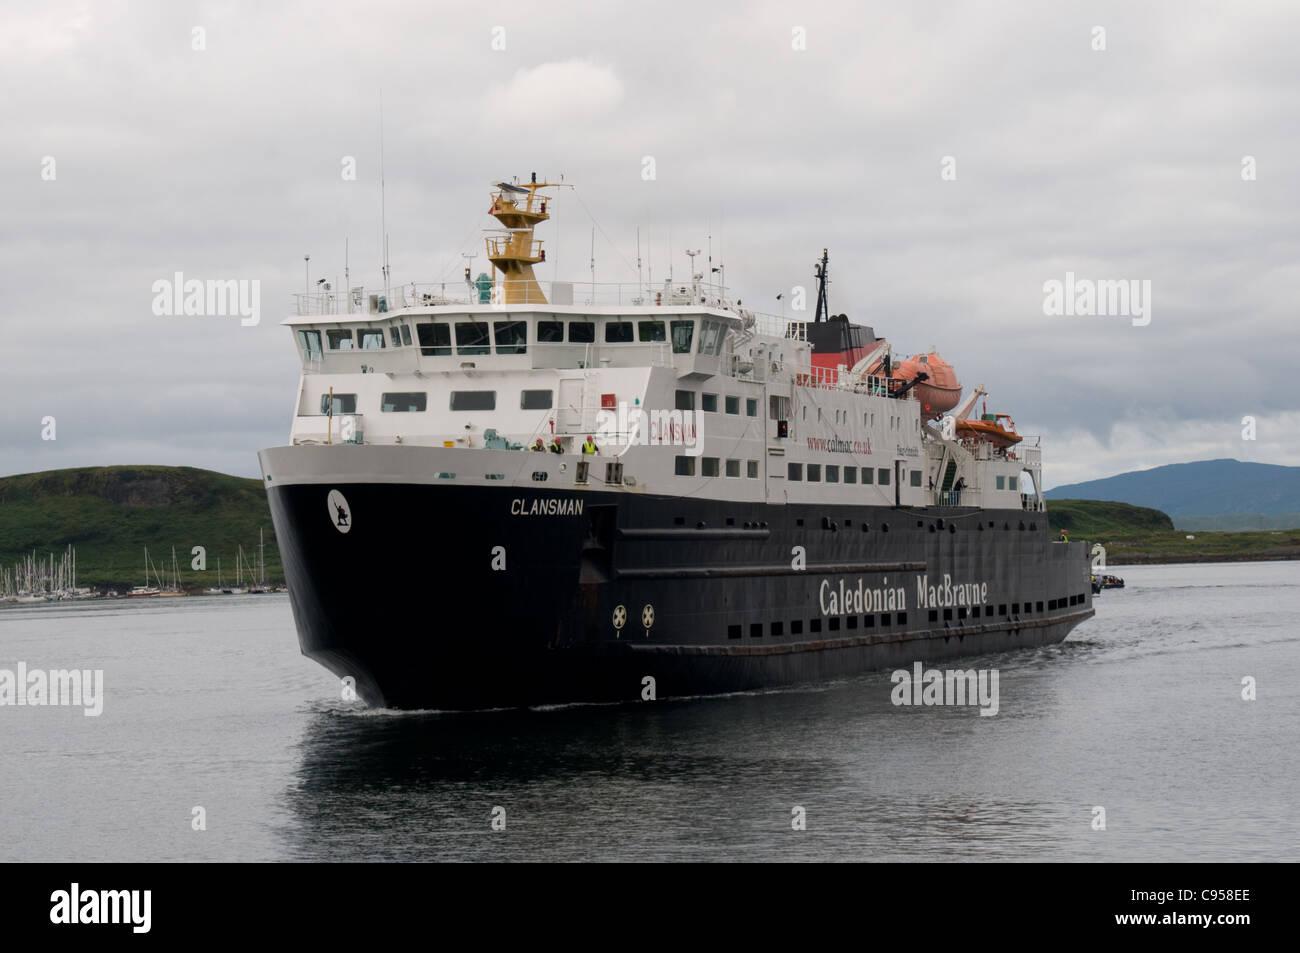 The Caledonian MacBrayne ferry MV Clansman arrives in Oban , Scotland - Stock Image